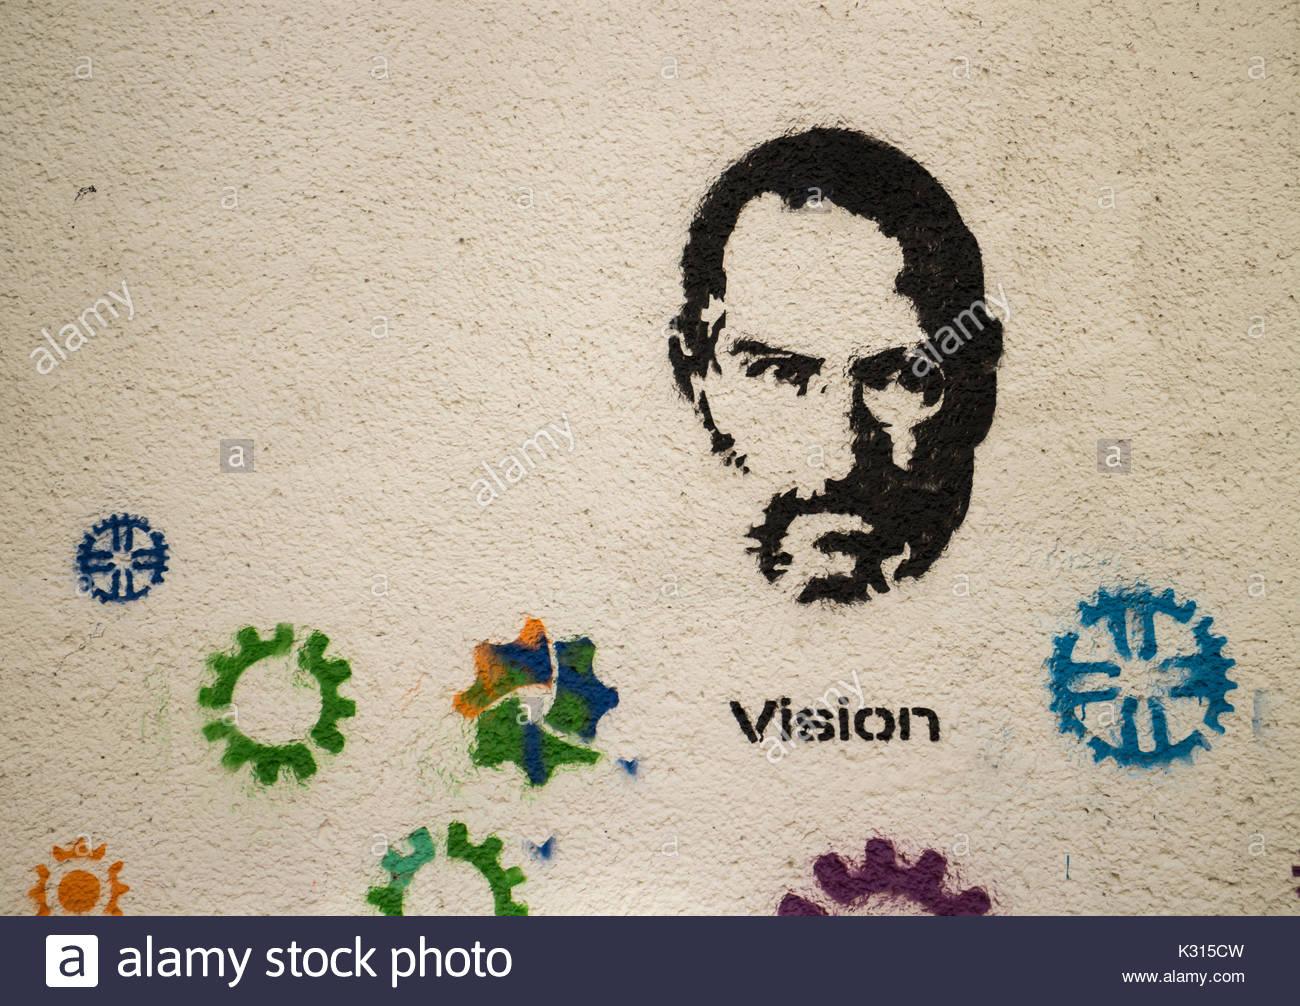 Steve Jobs graffiti on white wall, Vienna, Austria Aug 31, 2017 - Stock Image